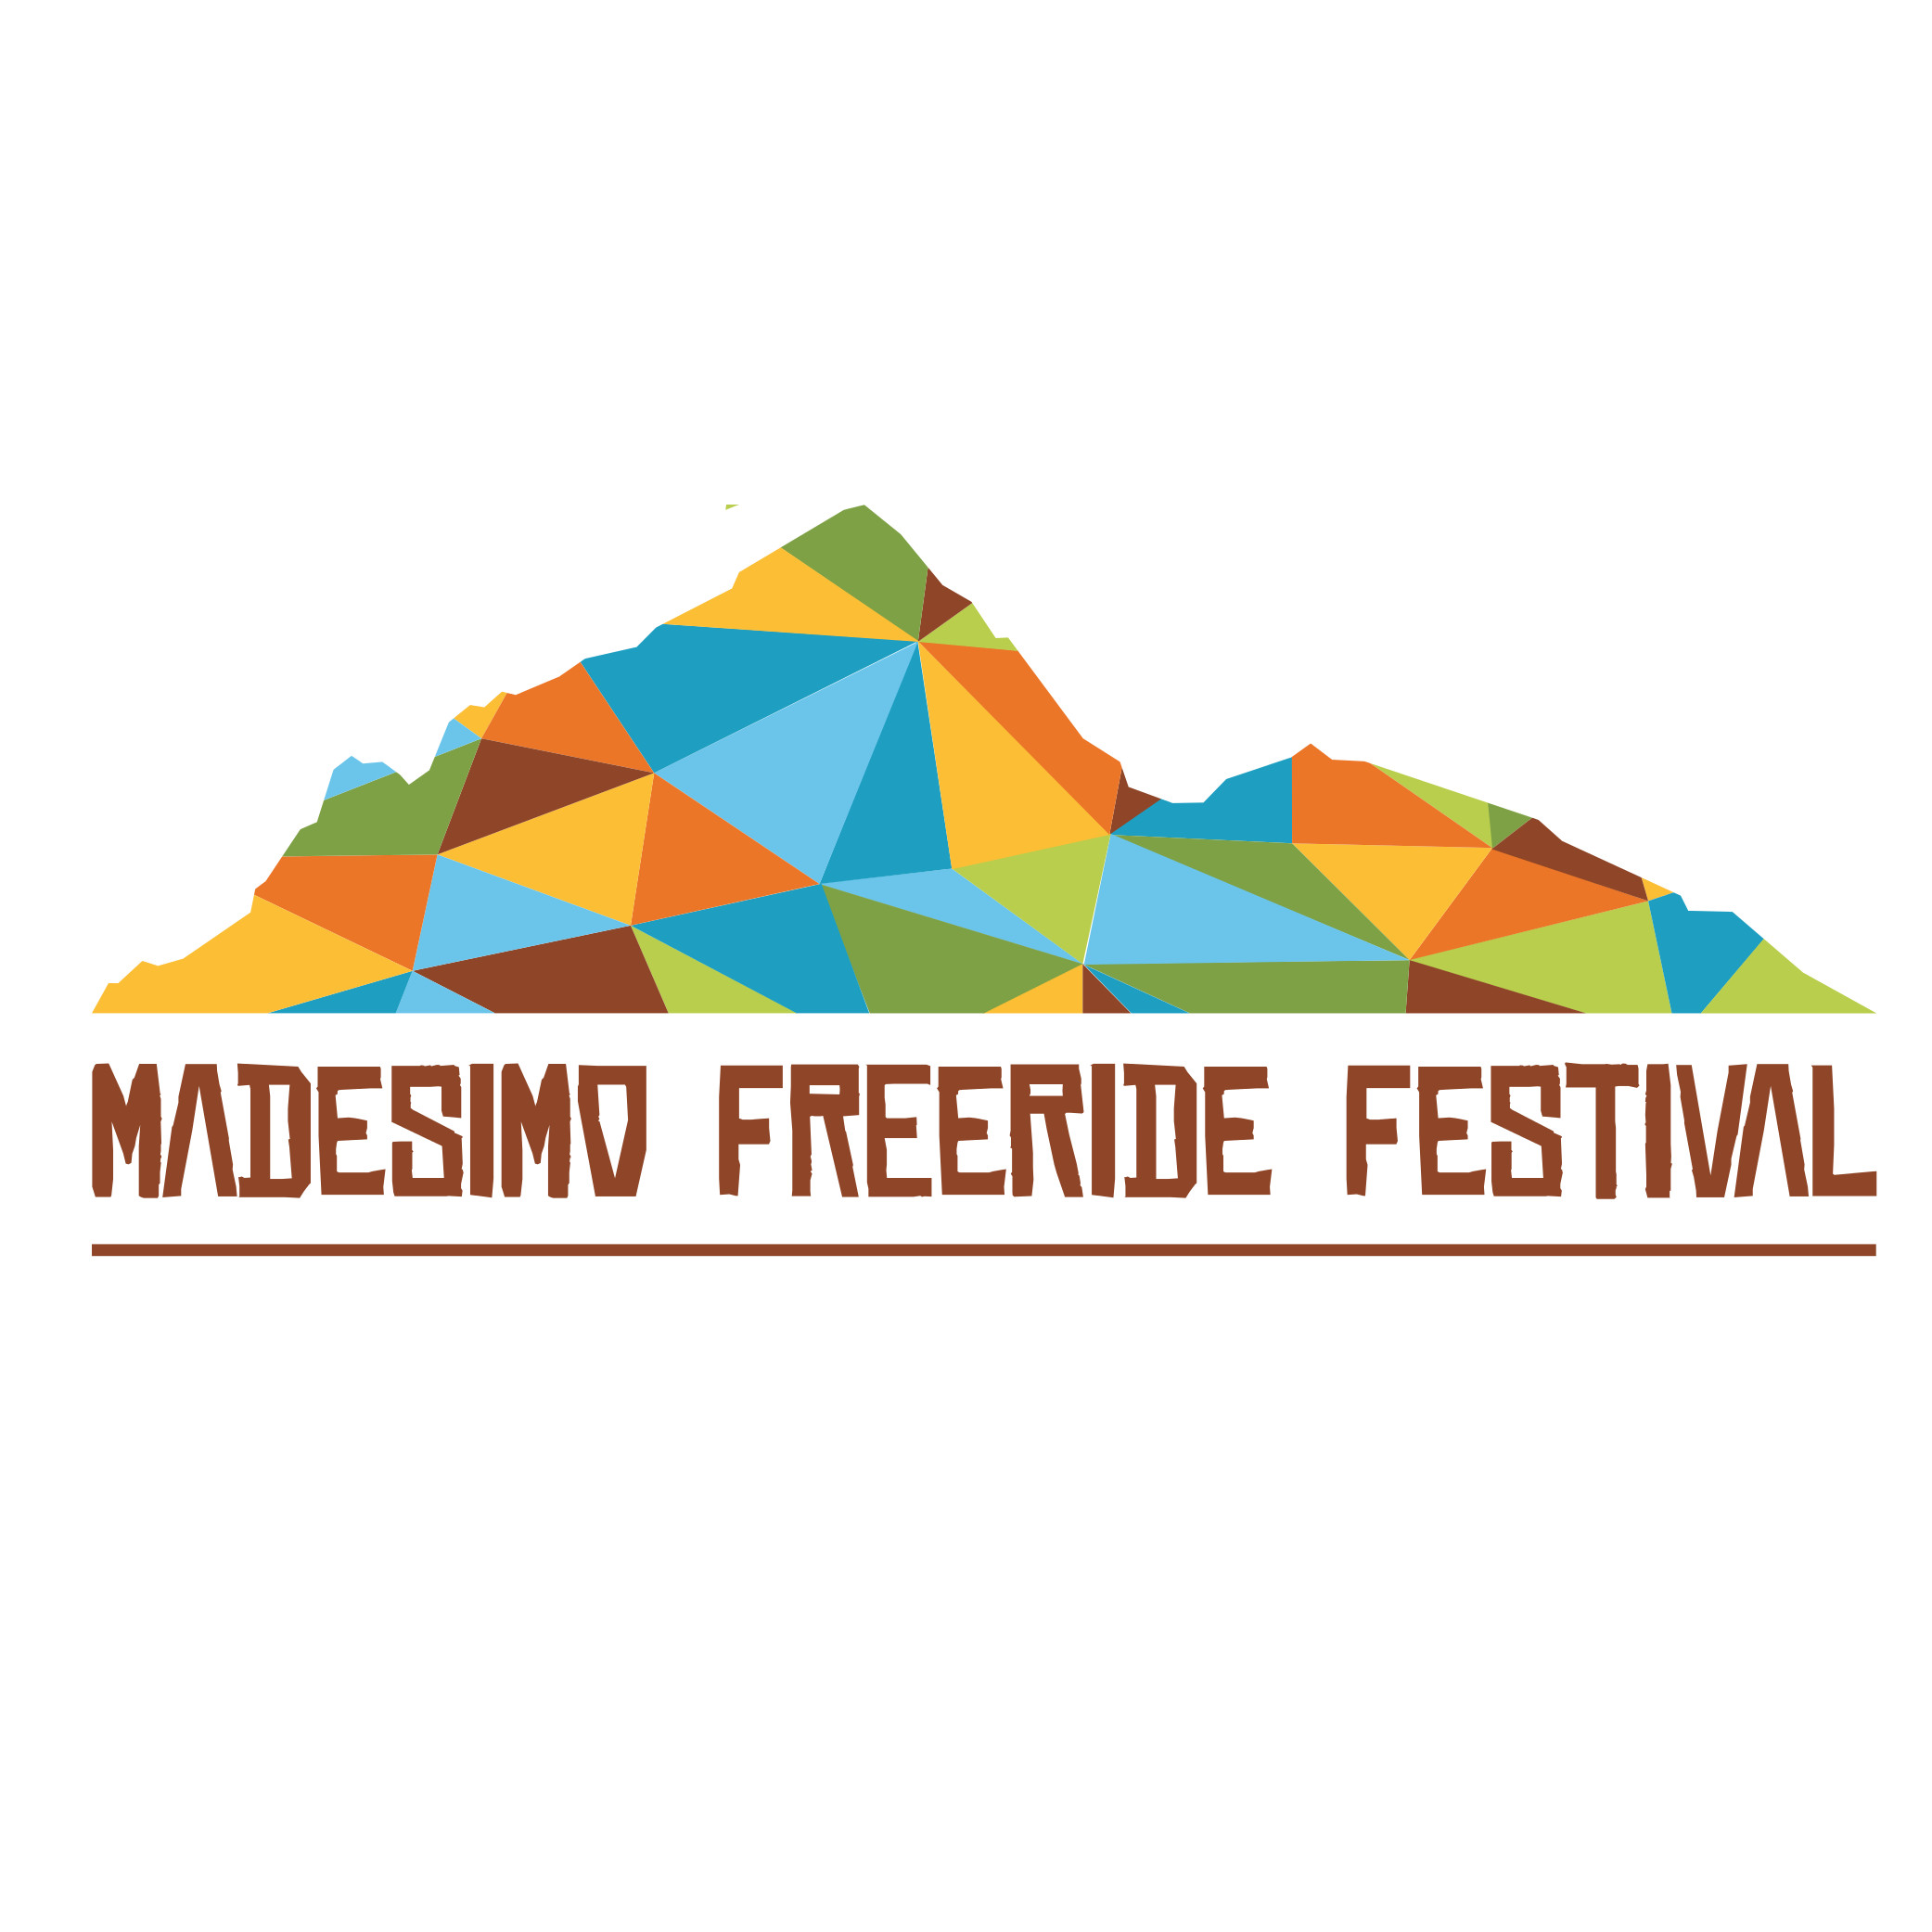 Madesimo Freeride Festival